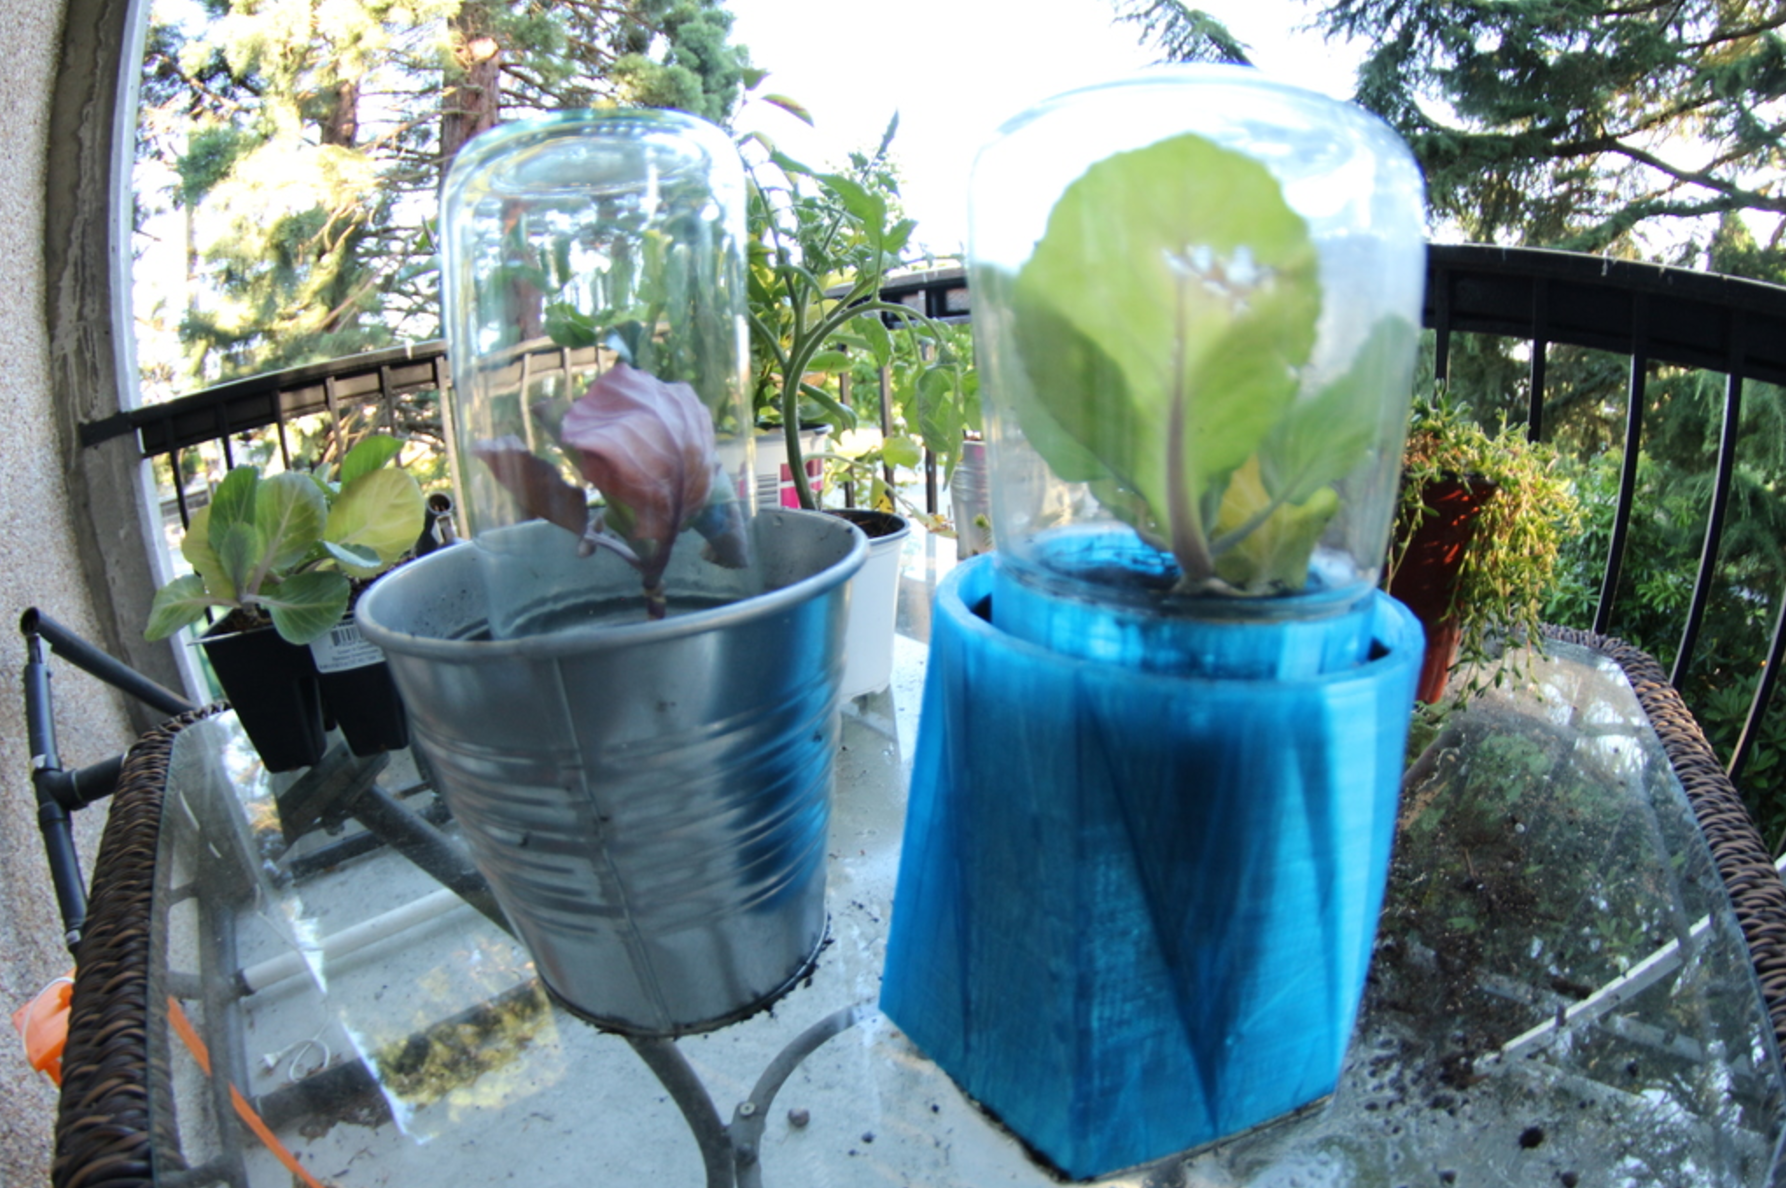 Invernadero Mini DIY6.png Download free STL file Greenhouse Mini DIY • 3D printer object, Gonzalor